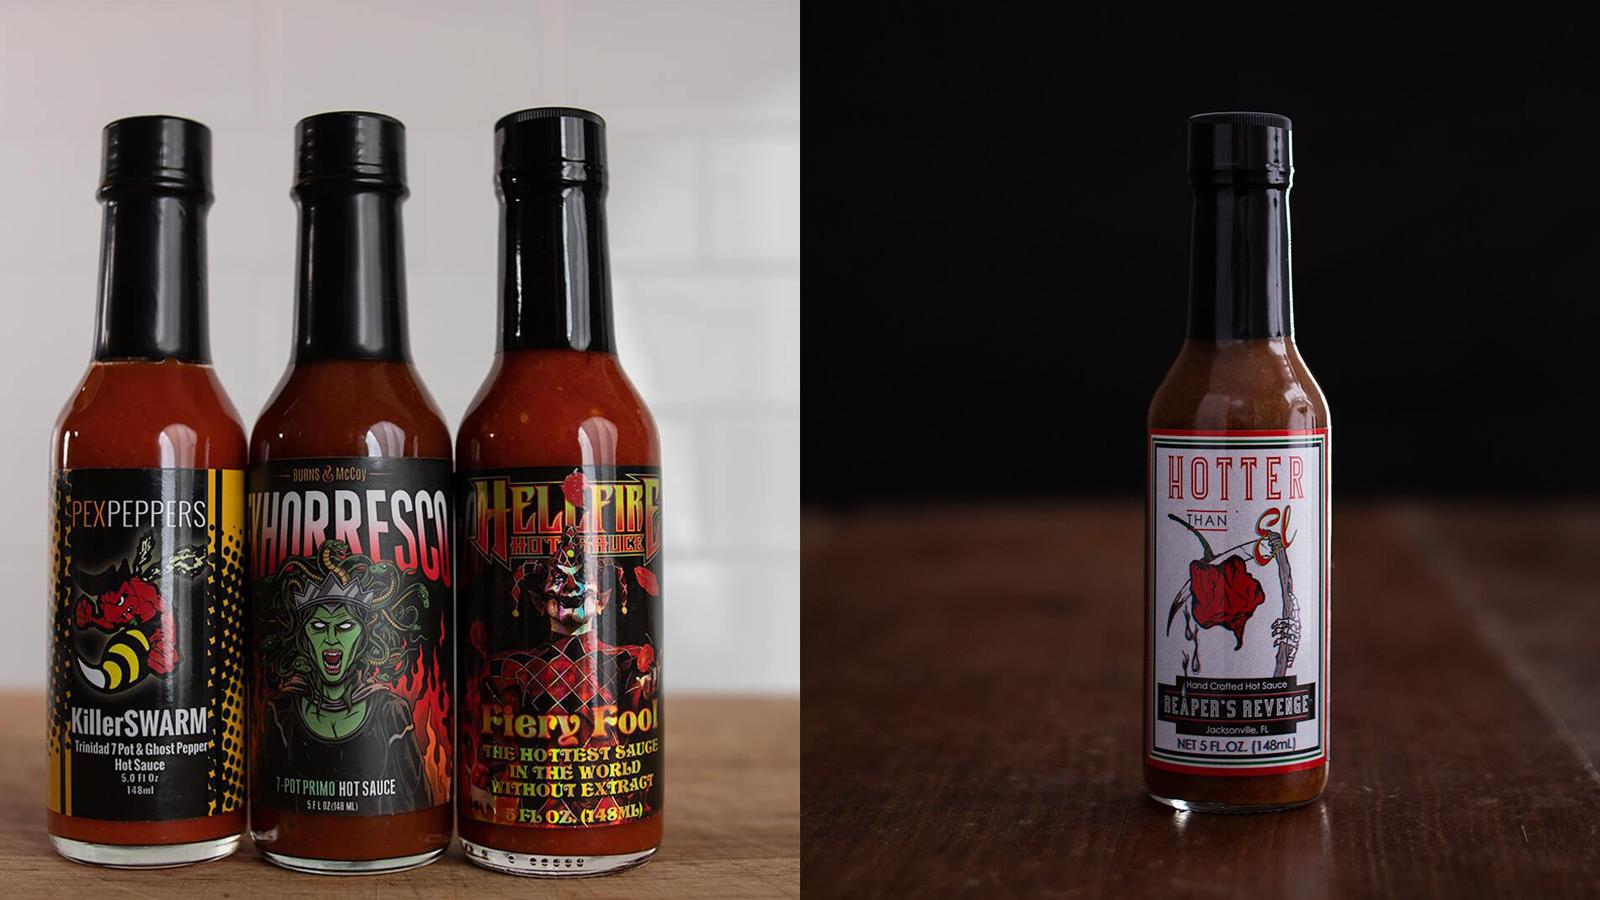 Doc Hotties hot sauce bottles from past orders